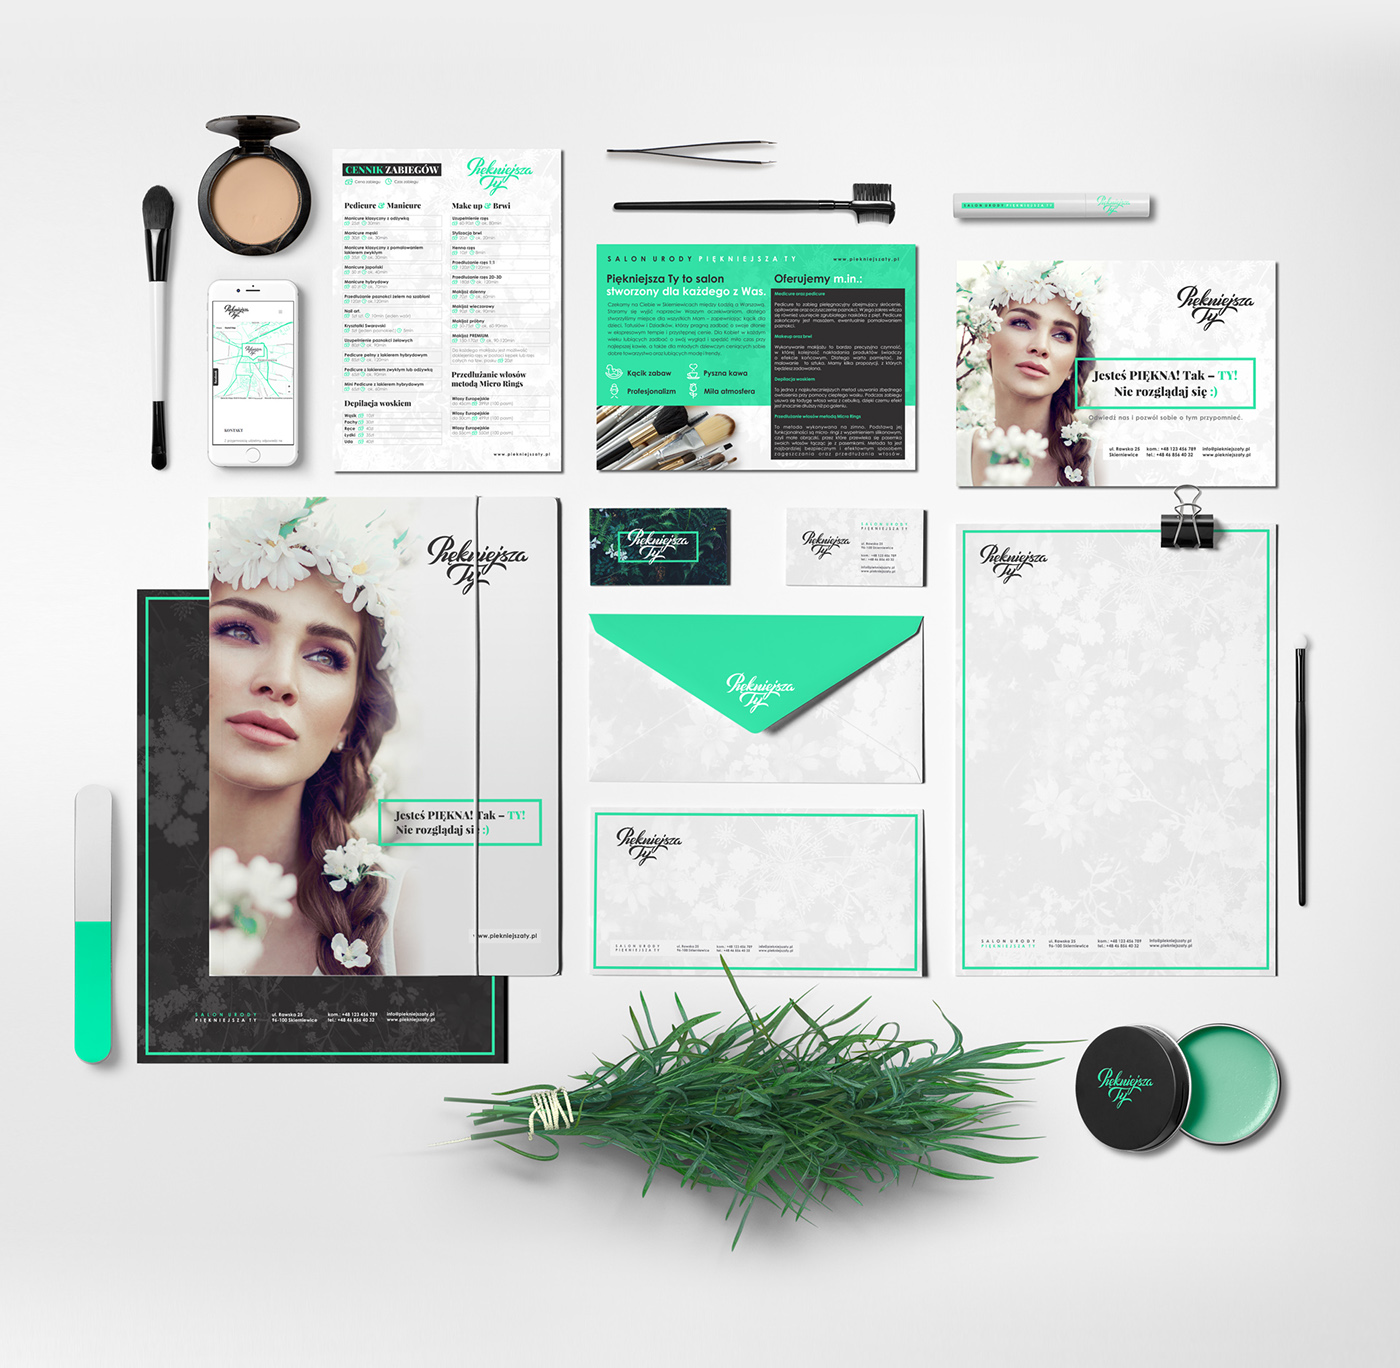 beauty cosmetics logo corporateidentity branding  Spa green natural makeup agenza